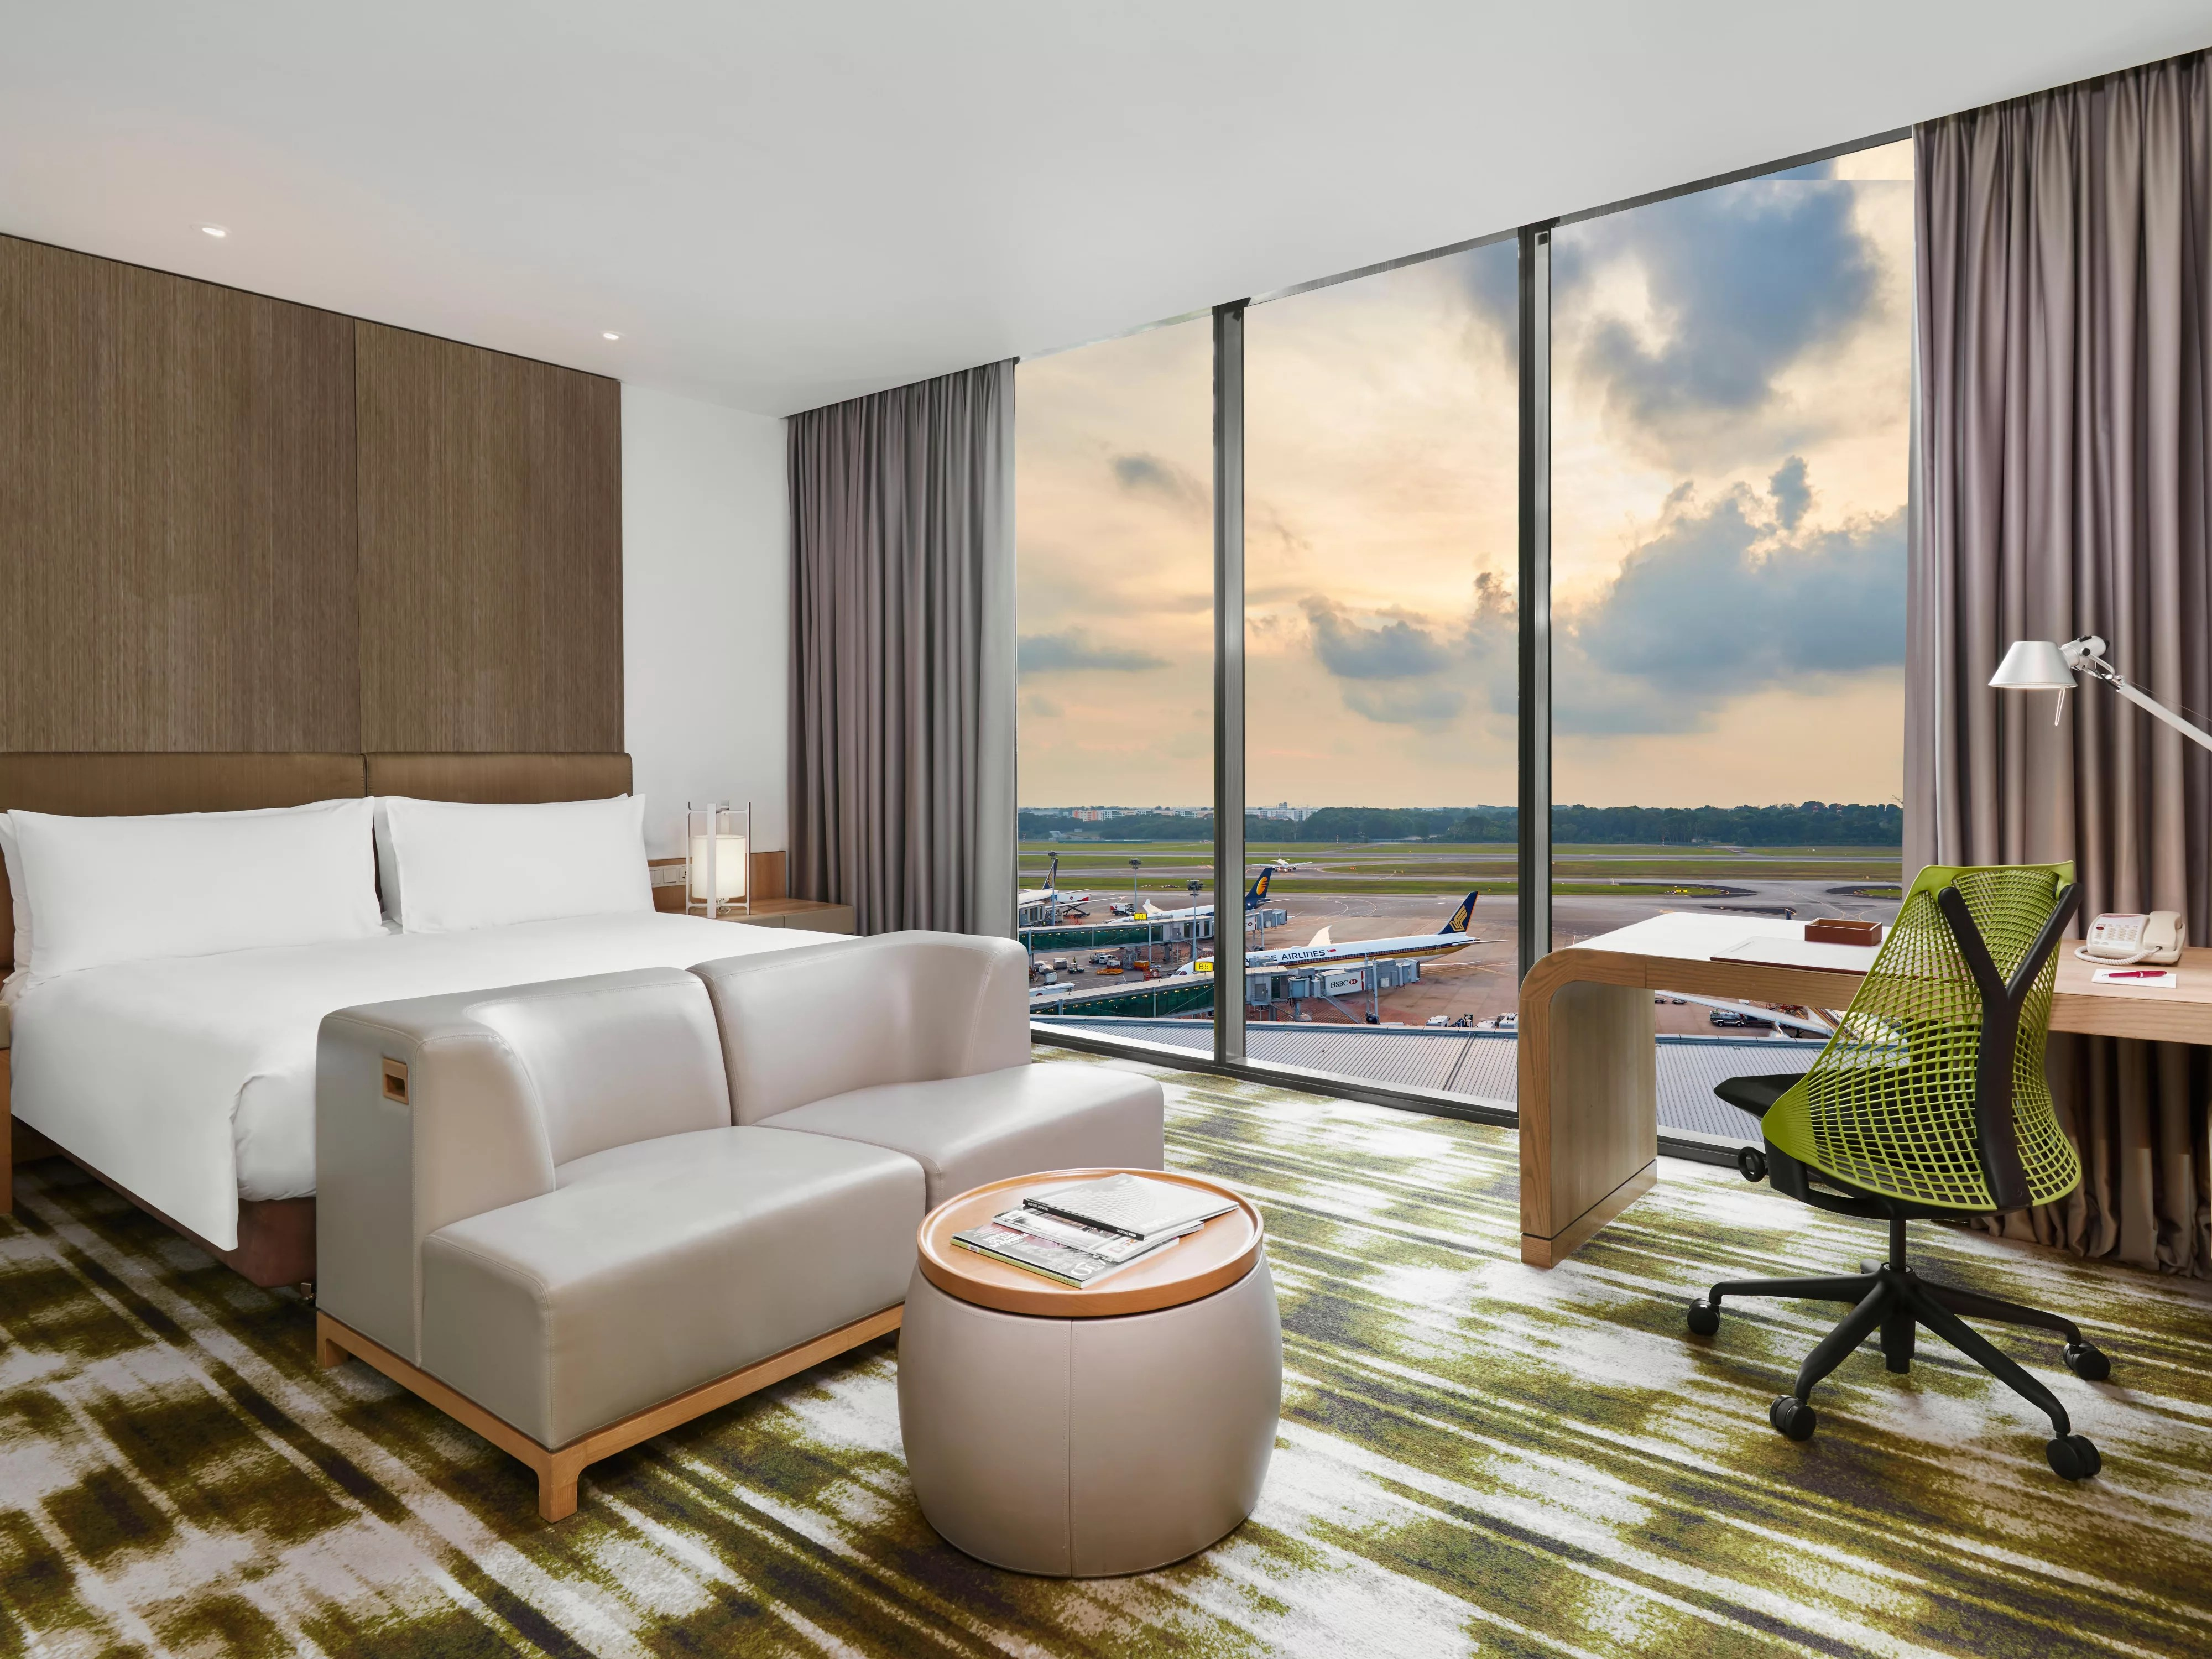 htl recliner sofa singapore express delivery sofas holiday inn serangoon 시내 호텔을